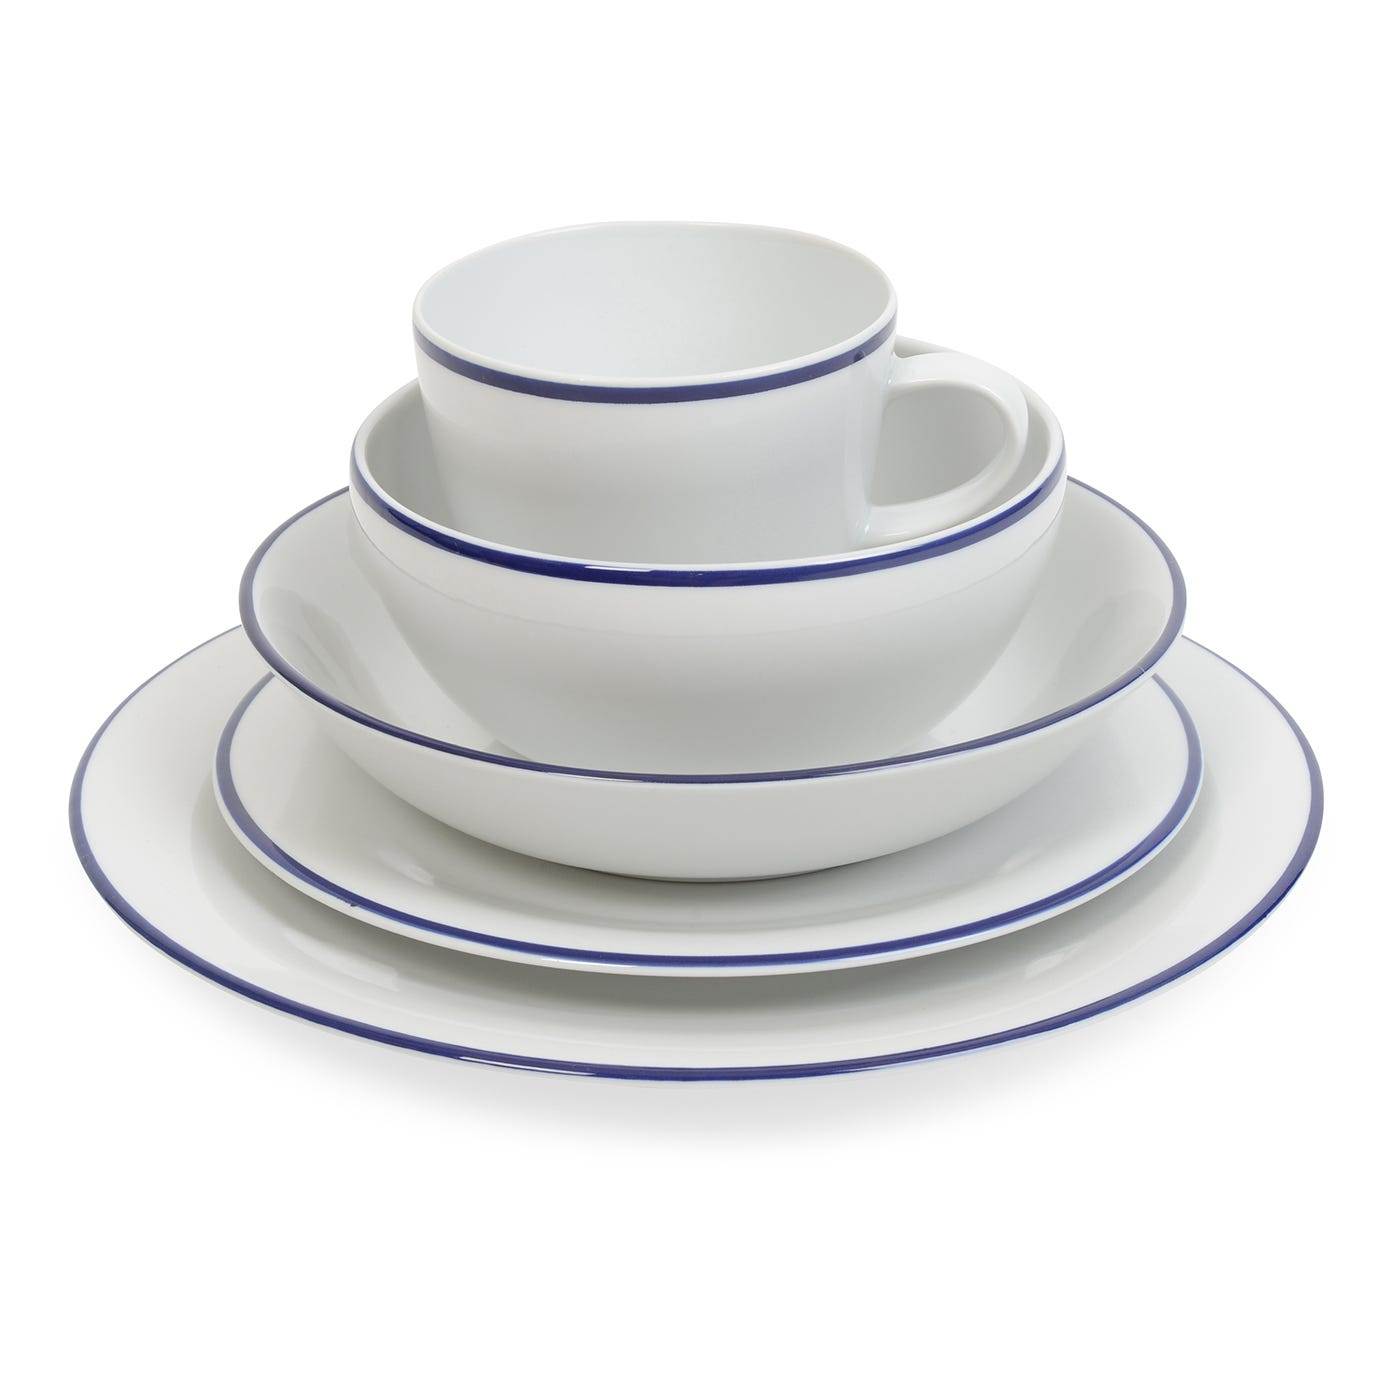 Seamless Blue Tableware